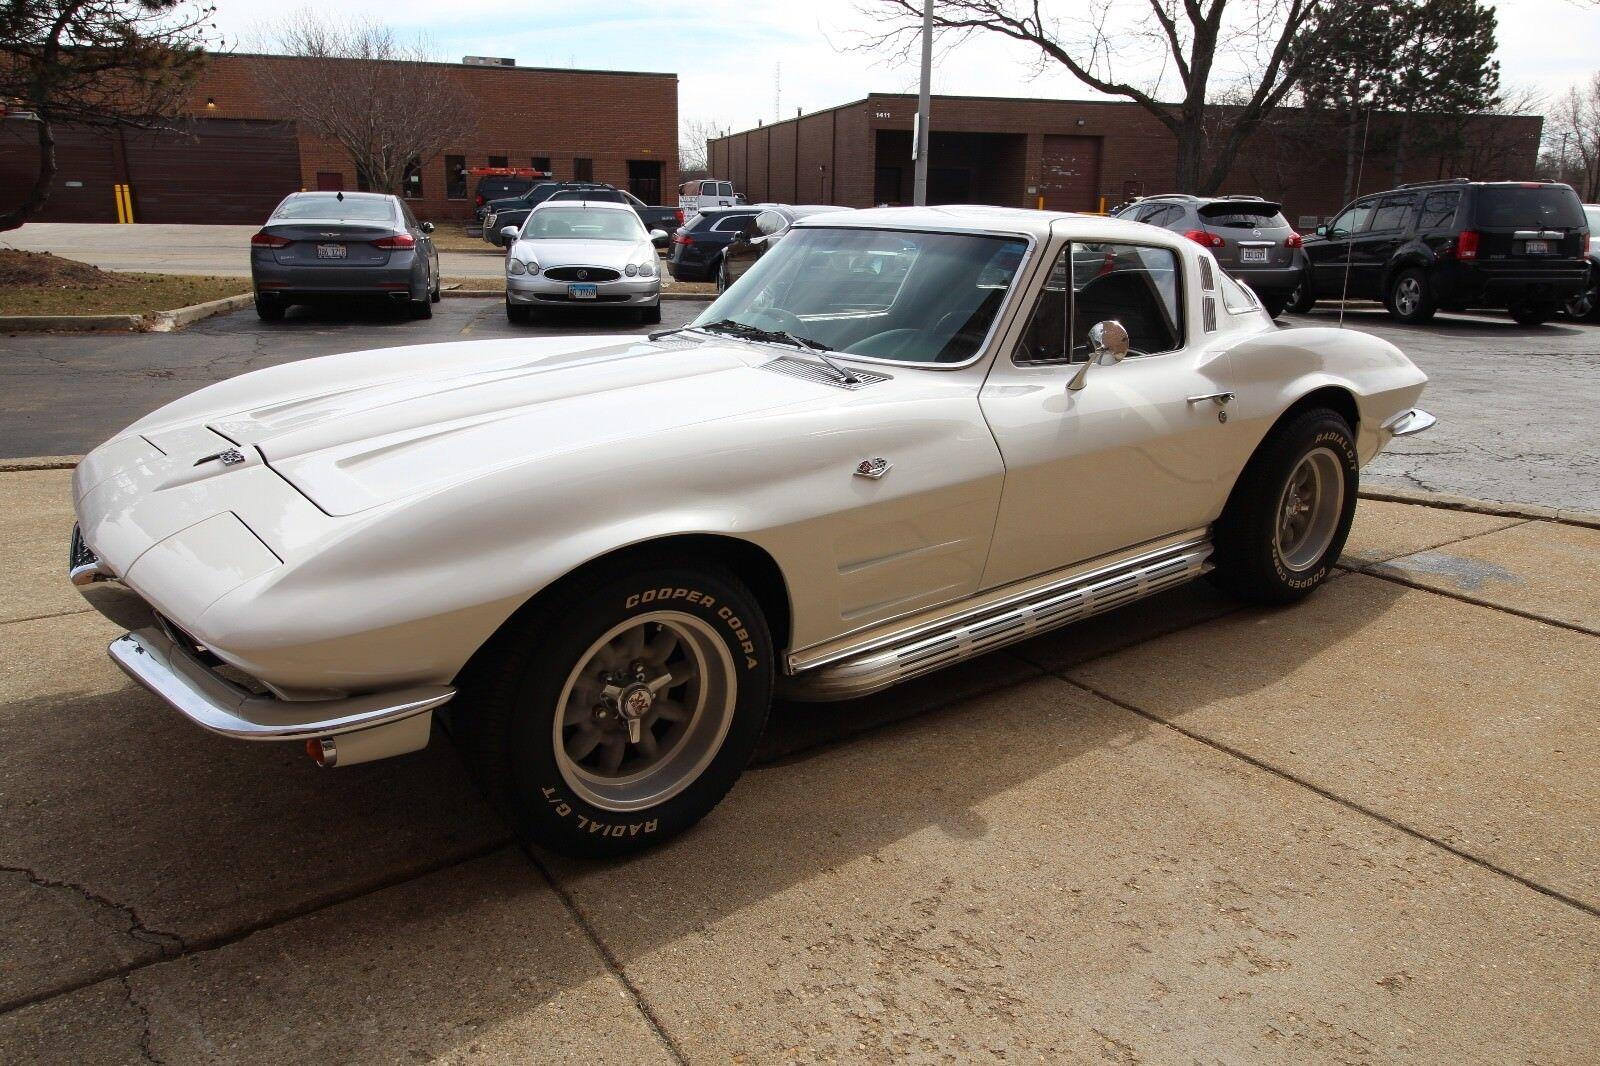 1964 Chevrolet Corvette - A/C Power Windows 1964 Chevrolet Corvette - A/C Power Windows 1965 1966 1967